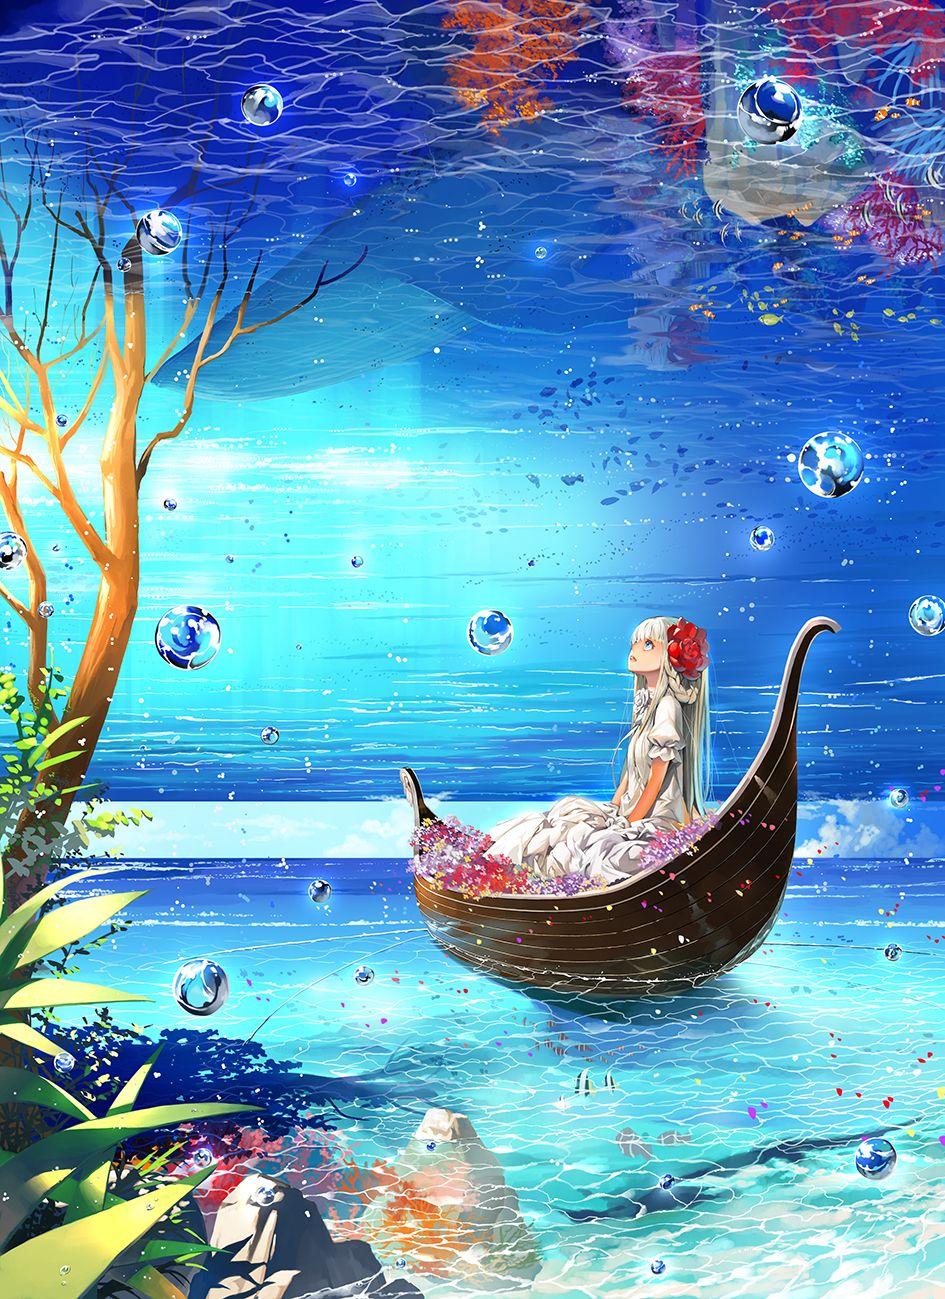 ANIME ART anime scenery. . .underwater. . .boat. . .trees ...